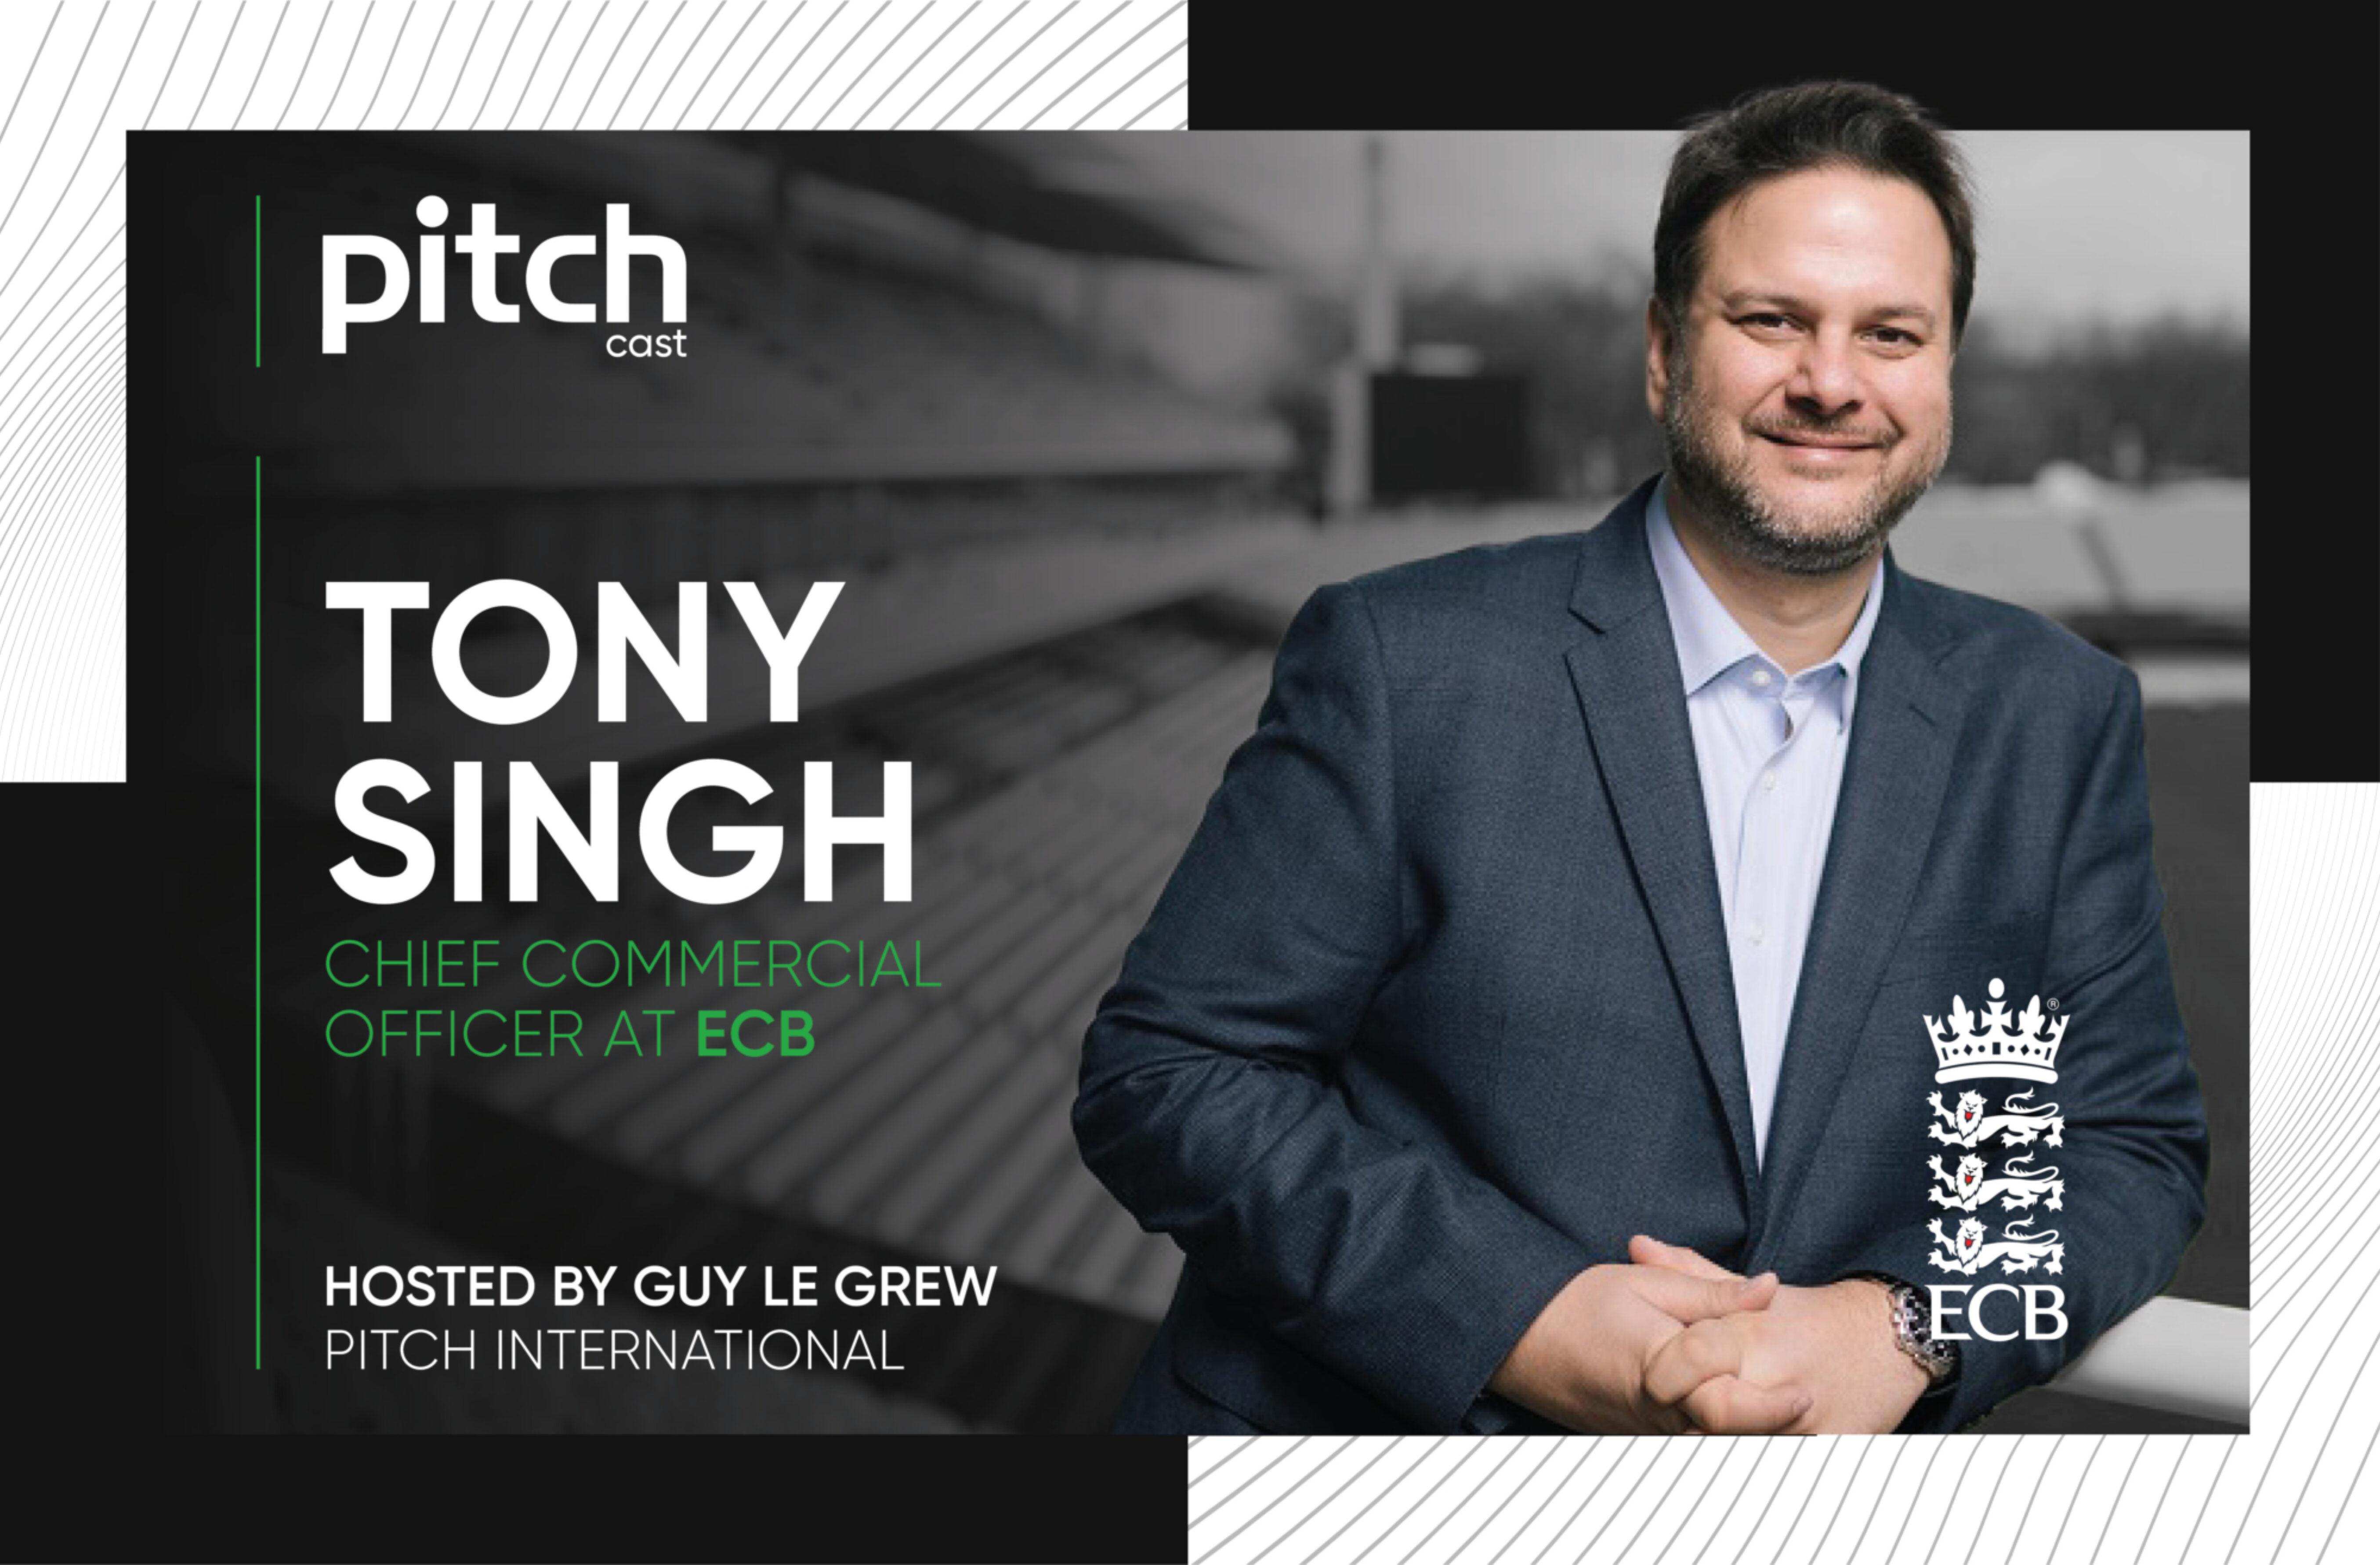 Pitch cast Tony Singh